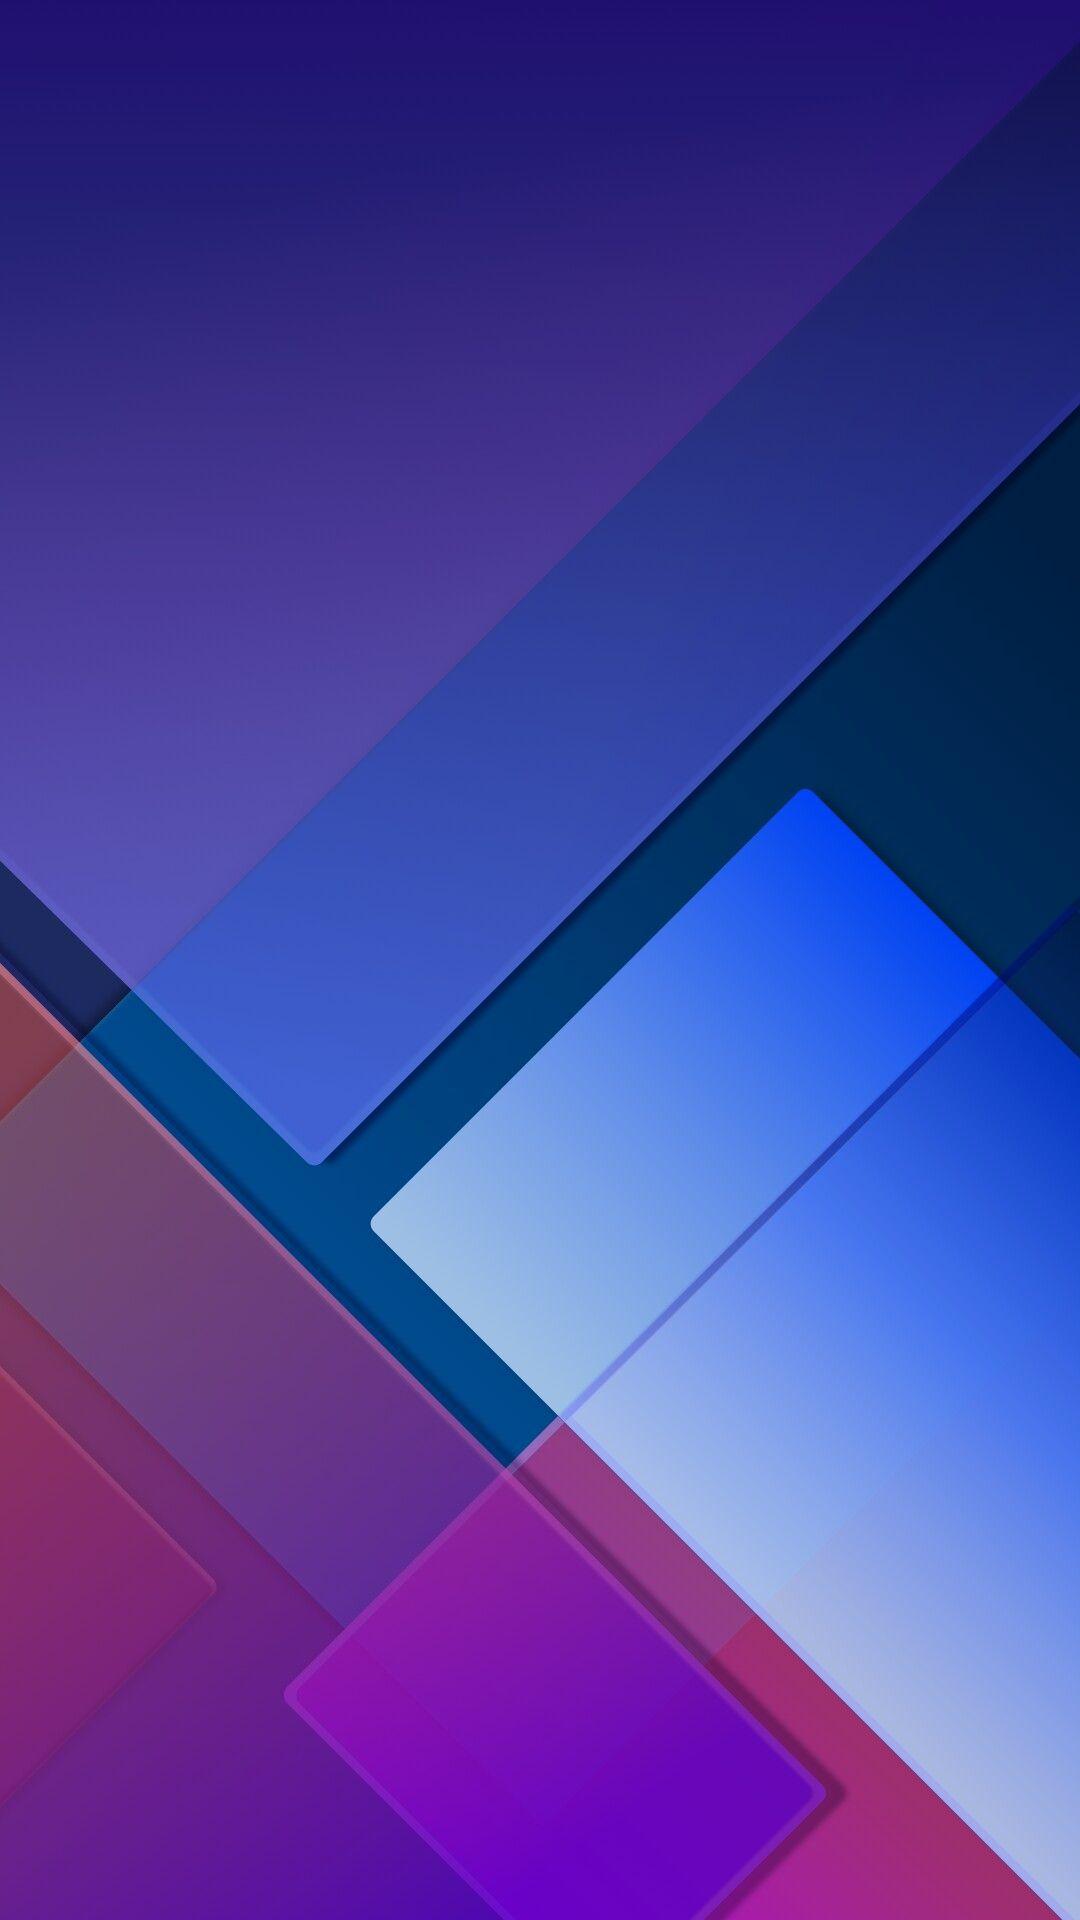 Angular Class Iphone Homescreen Wallpaper Backgrounds Phone Wallpapers Unique Wallpaper